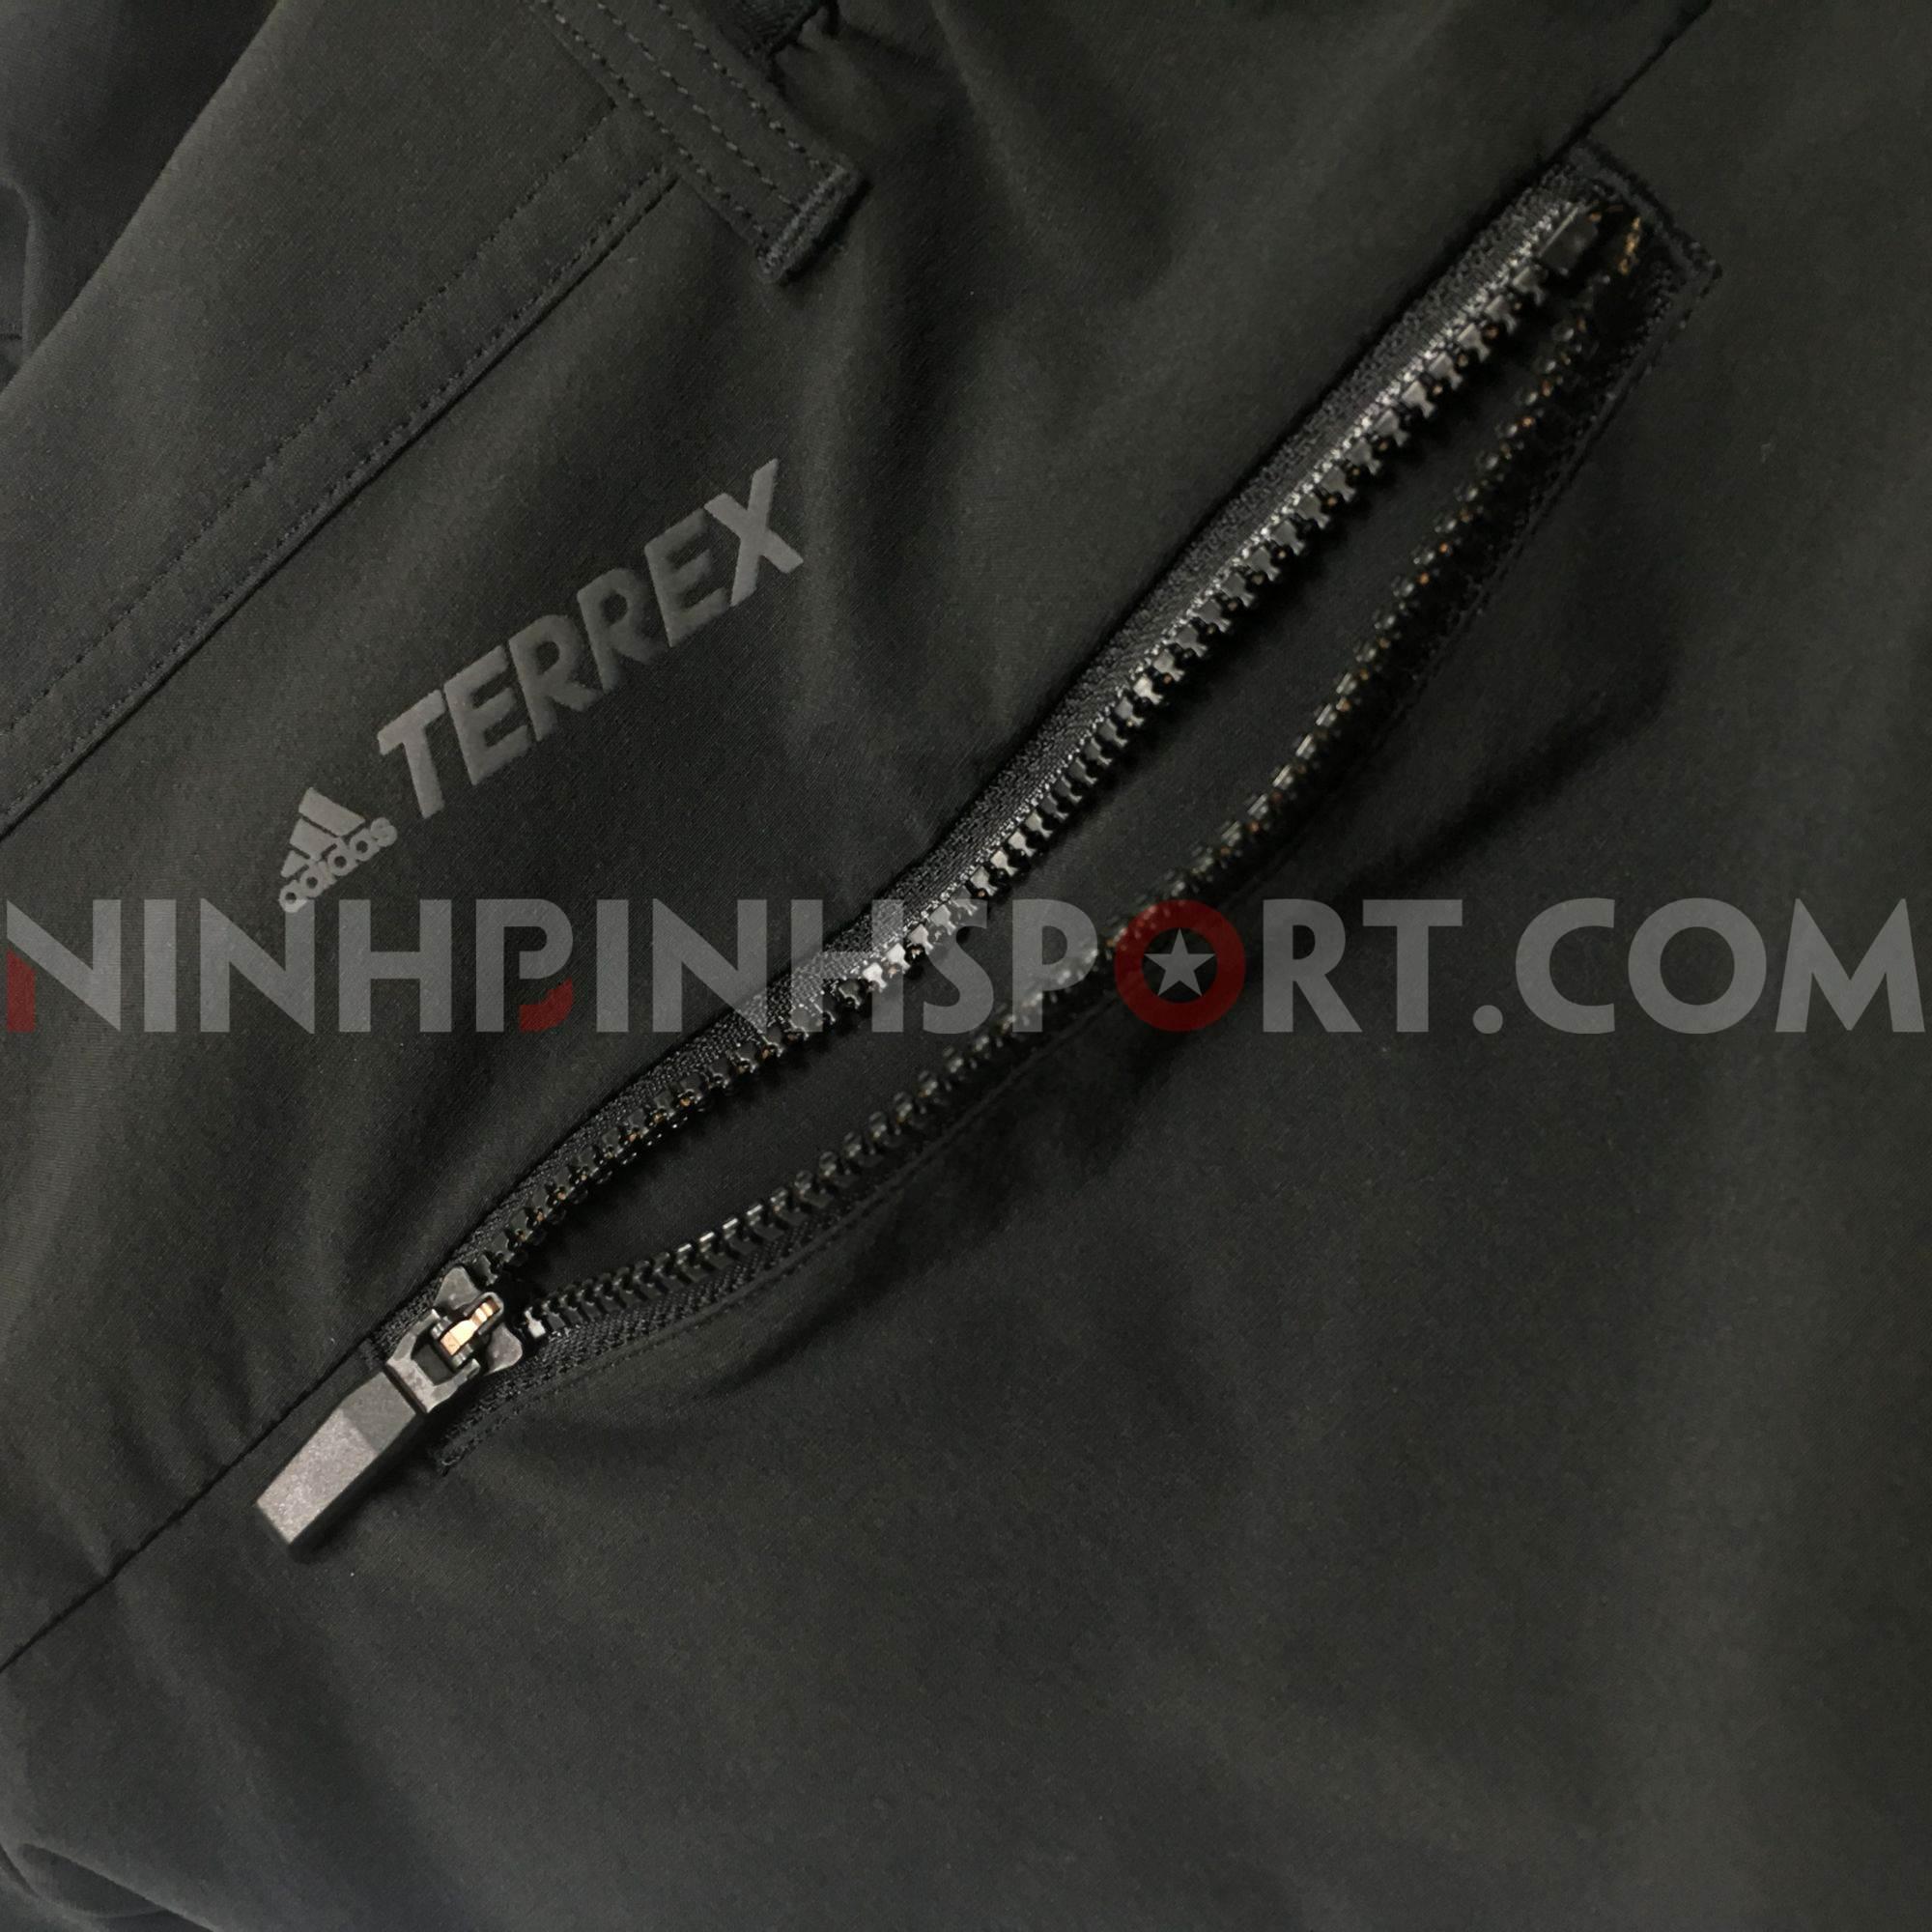 Quần dài thể thao nam Adidas Liteflex Black DQ1508